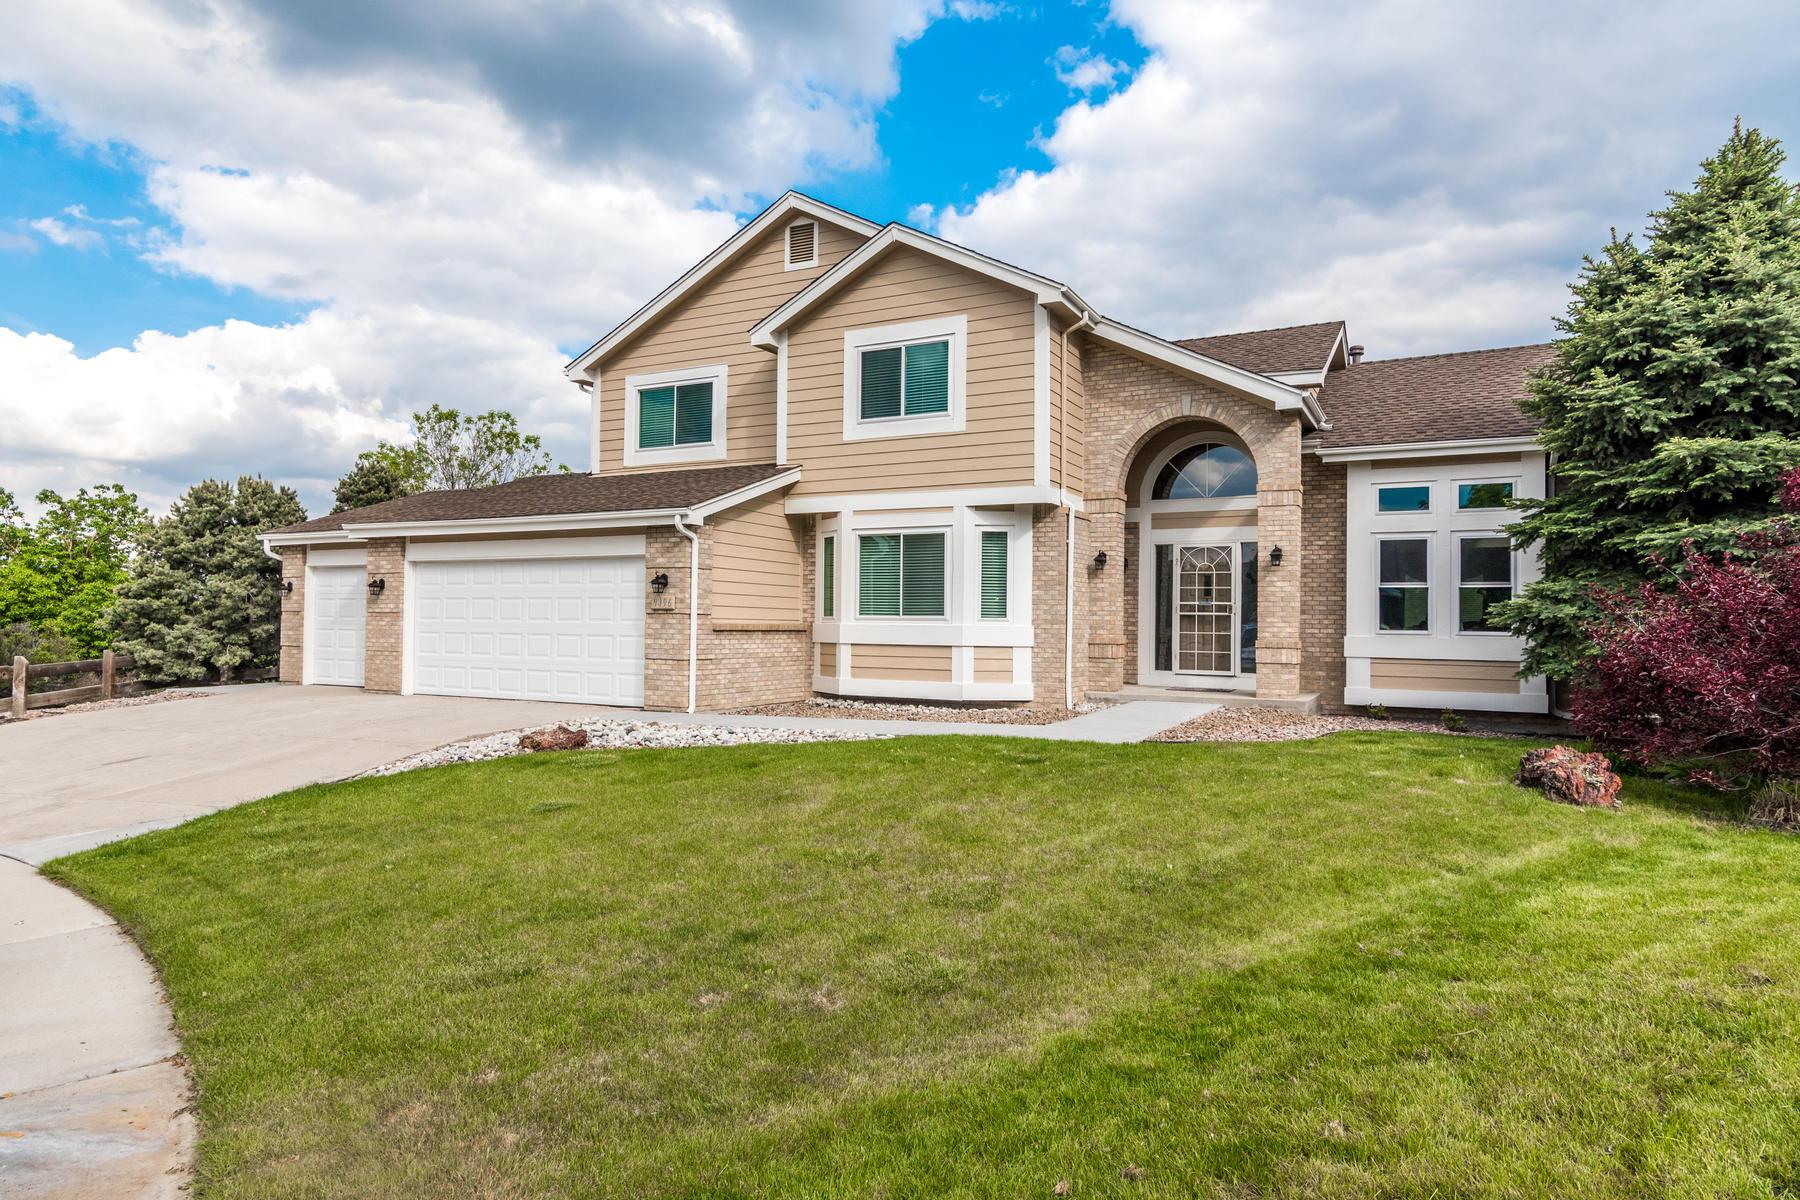 Single Family Homes για την Πώληση στο 9496 Sand Hill Place, CO, Highlands Ranch, Κολοραντο 80126 Ηνωμένες Πολιτείες